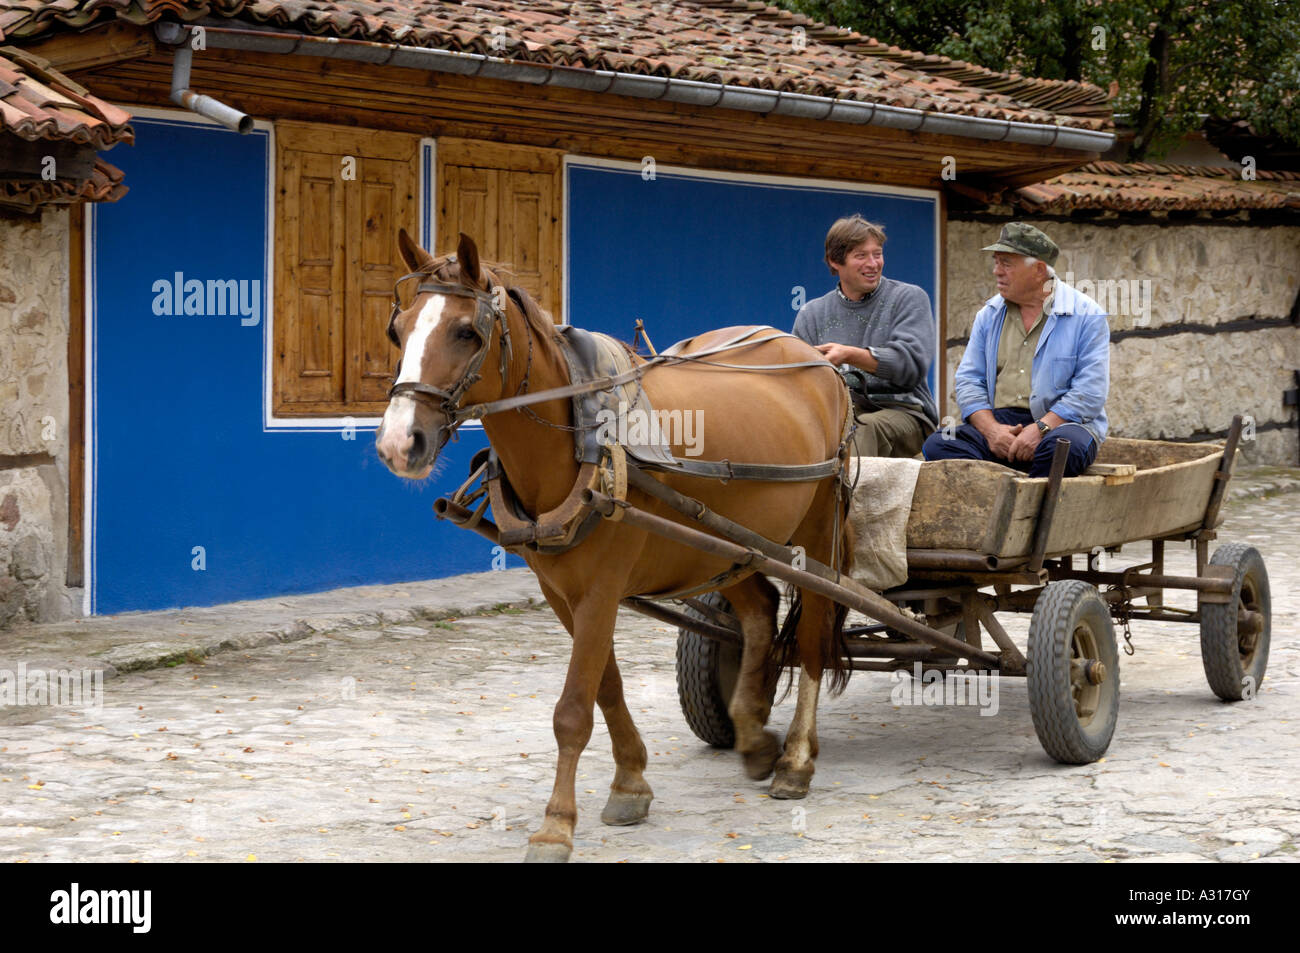 People riding horsecart Koprivshtitsa town museum Bulgaria East EuropeStock Photo